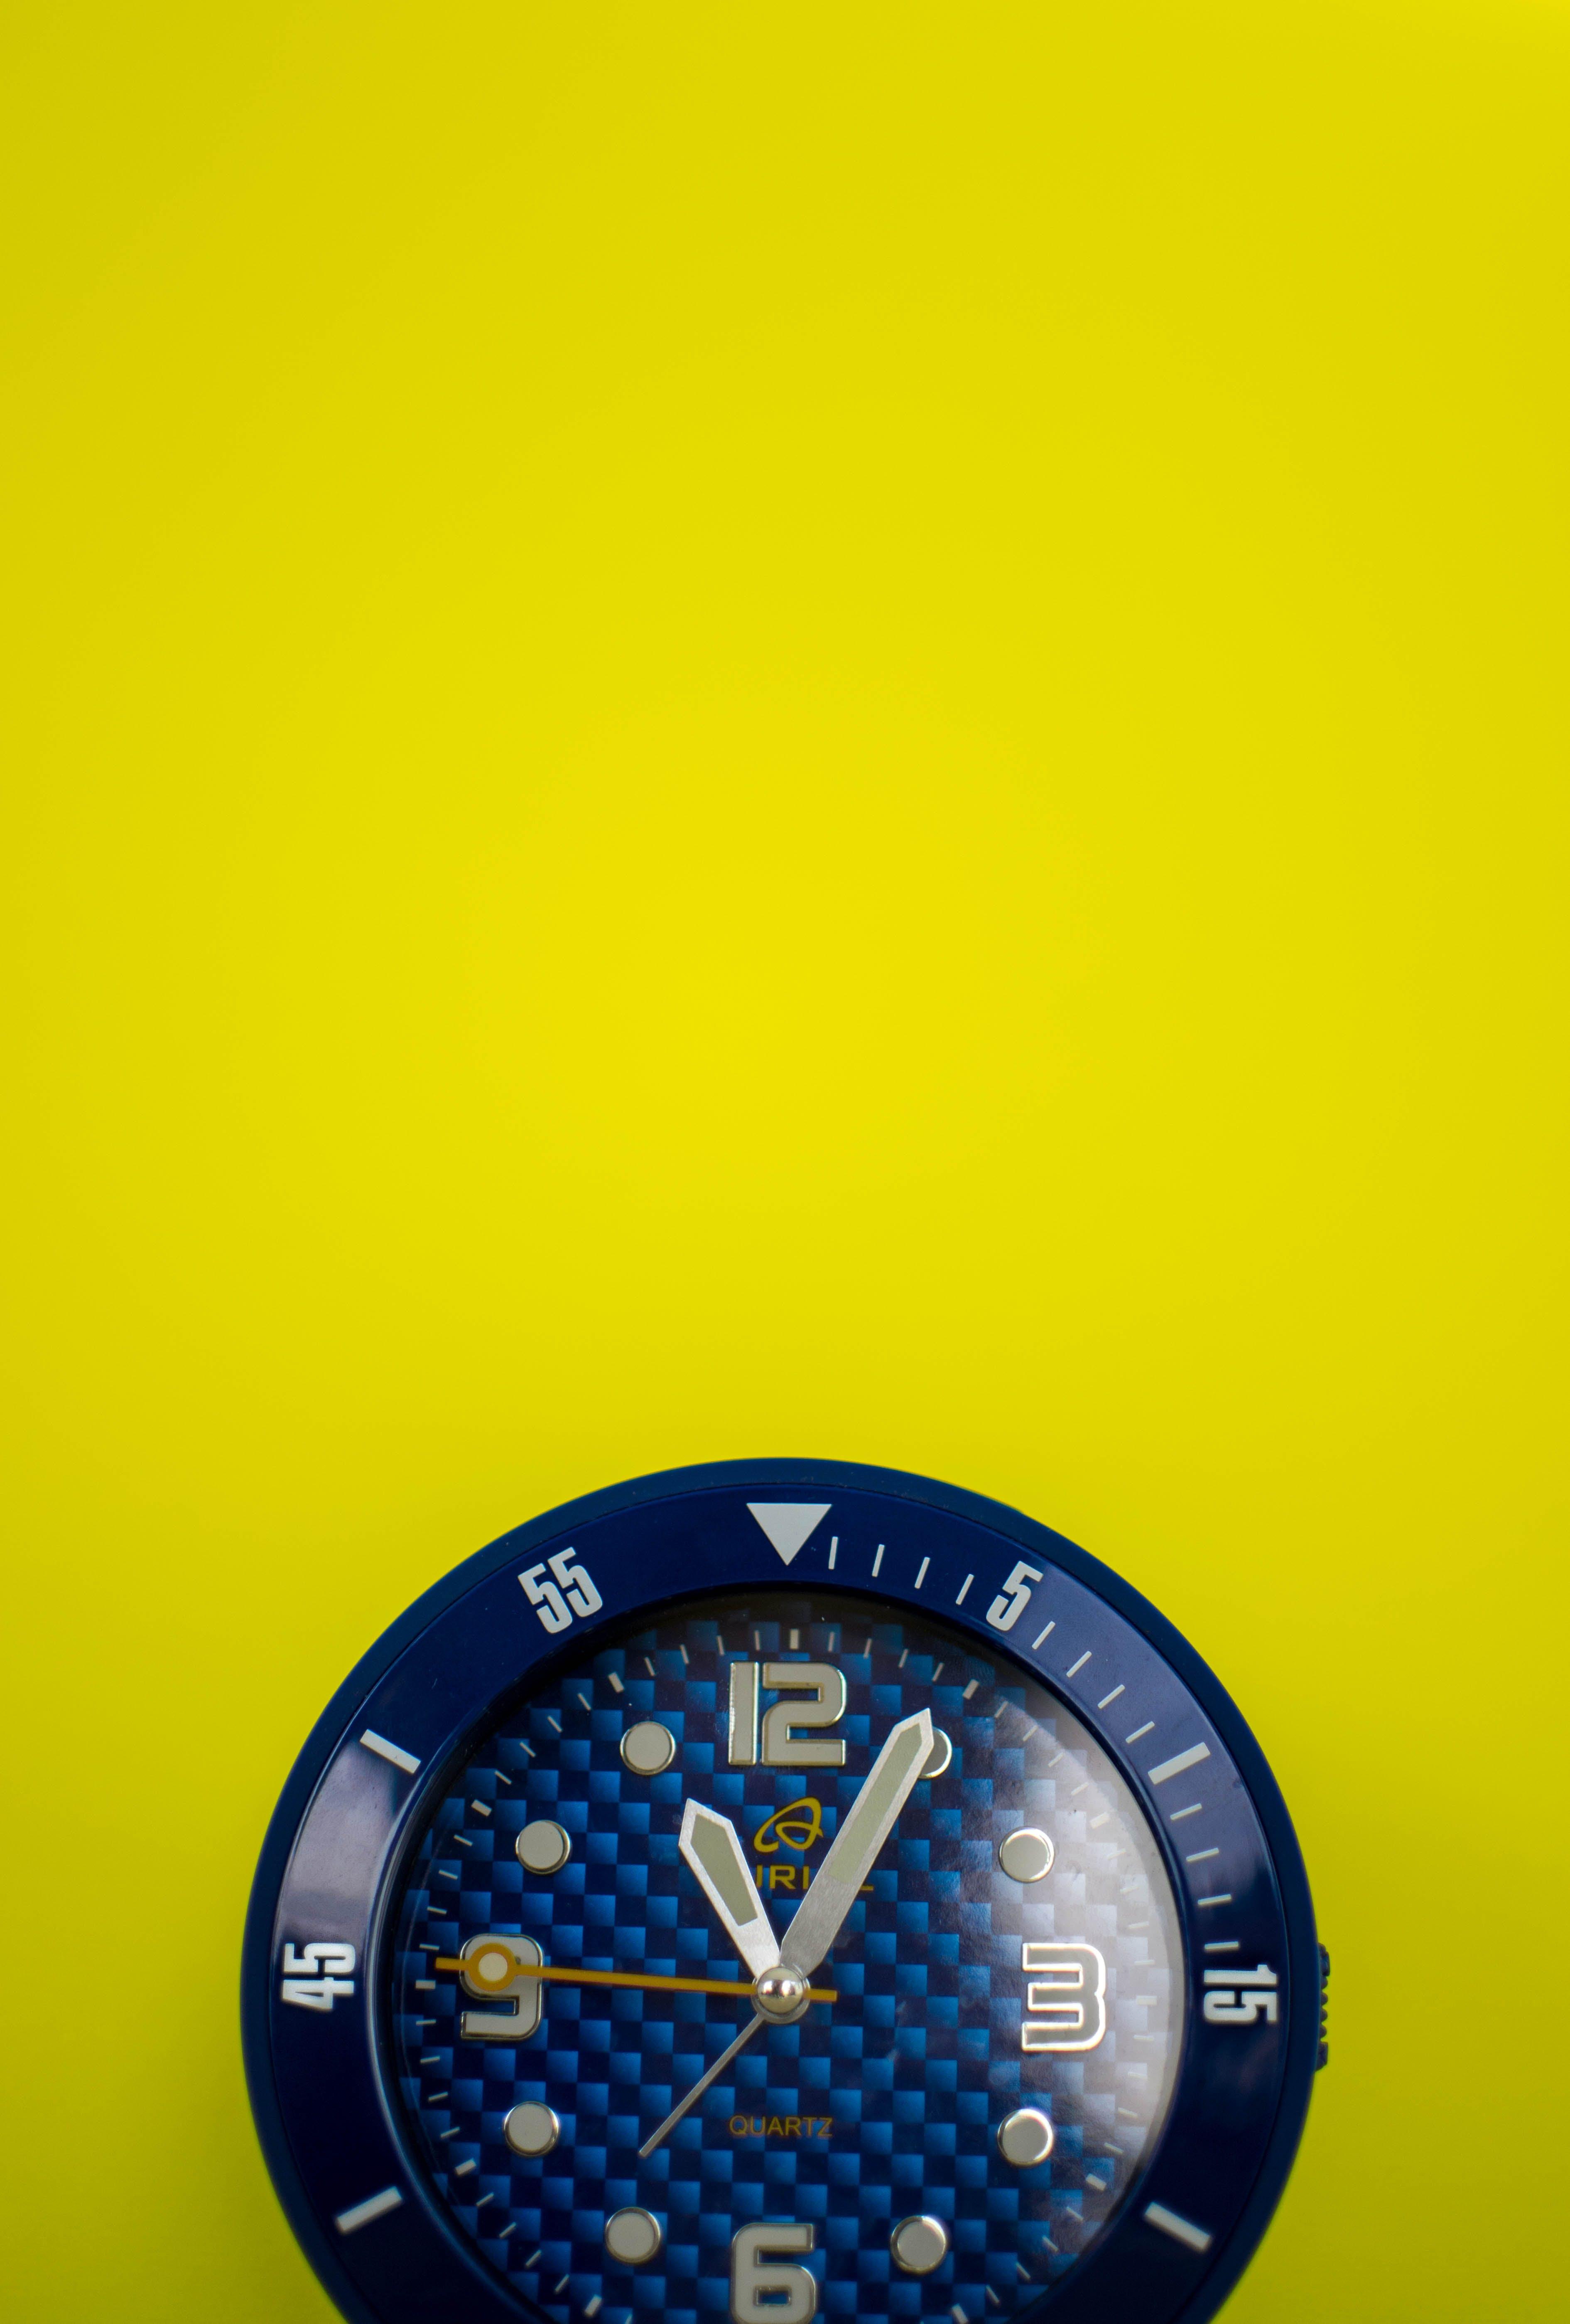 Closeup Photo of Round Blue Analog Watch